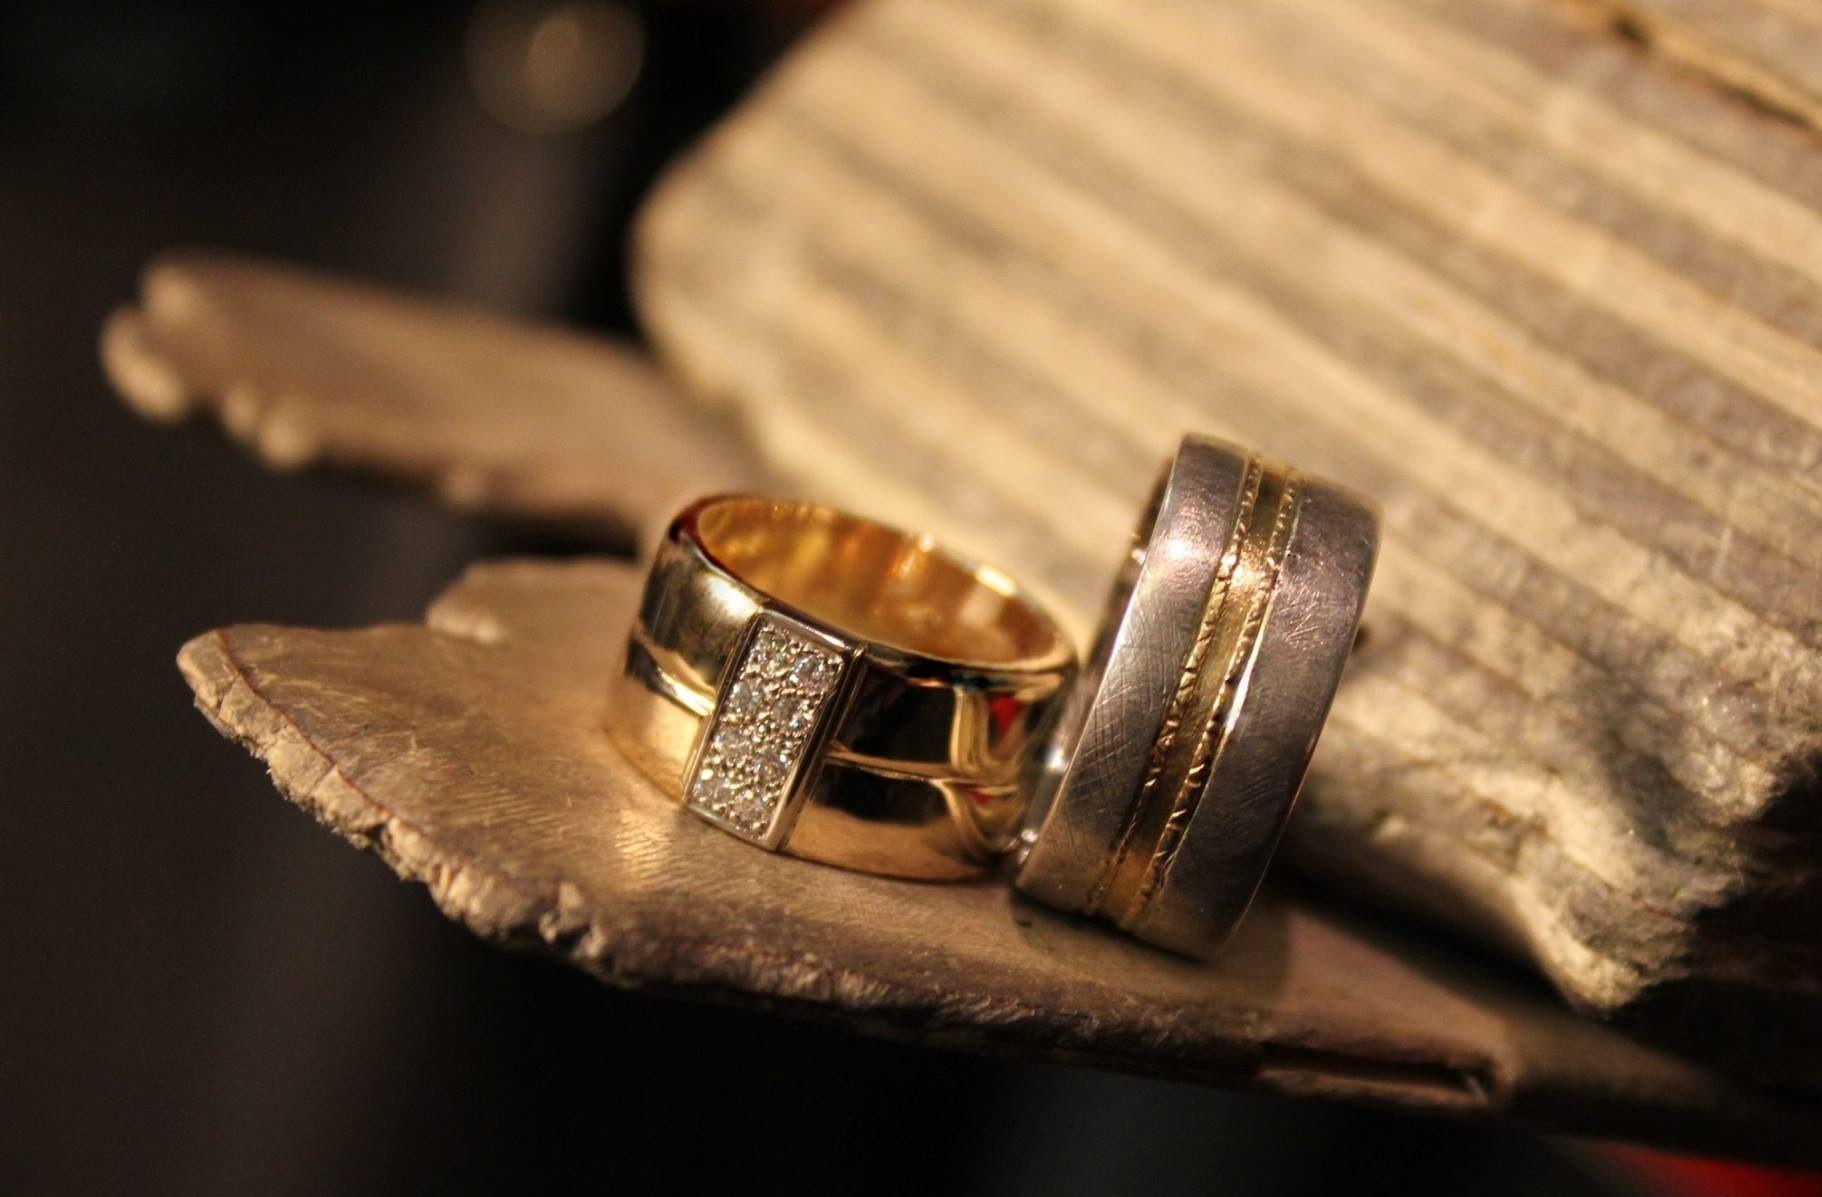 Keltakulta timanttisormus / patinoitu hopea, keltakulta sormus